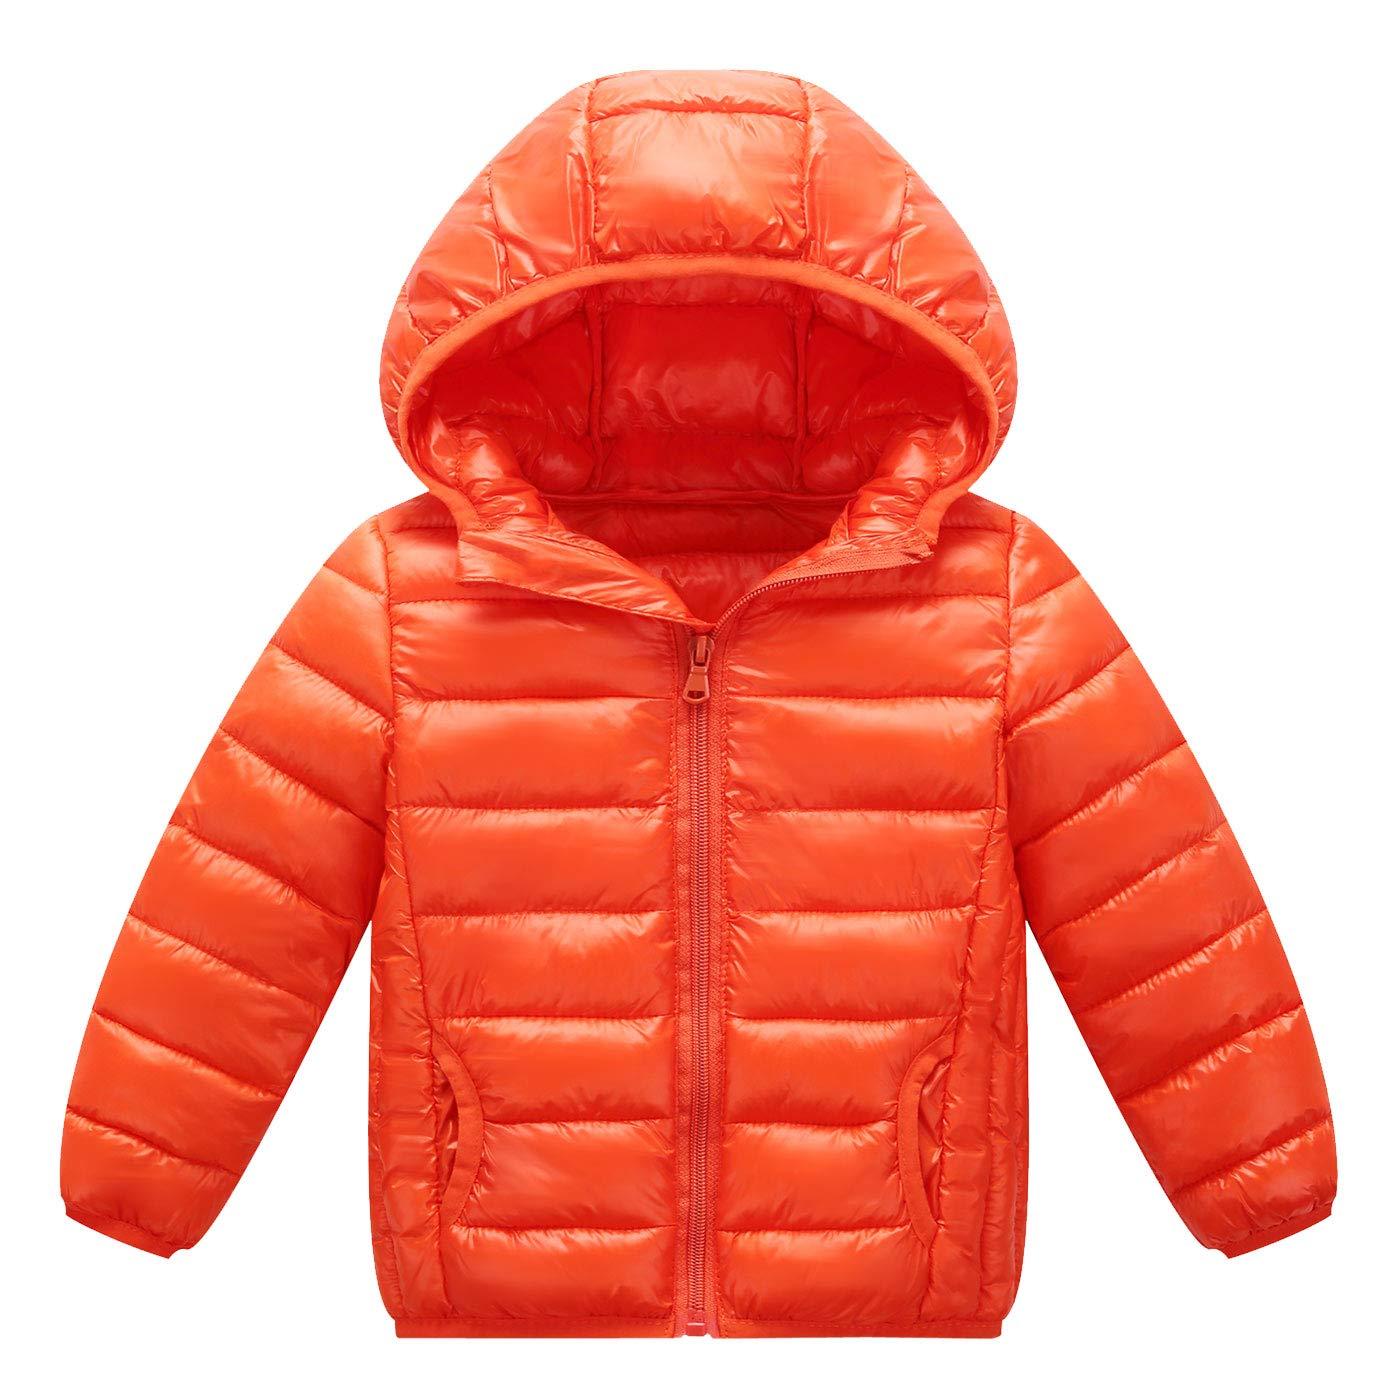 Happy Cherry Baby Boys Girls Down Coat Hooded Puffer Outwear Lightweight Winter Thick Coat Outerwear Orange